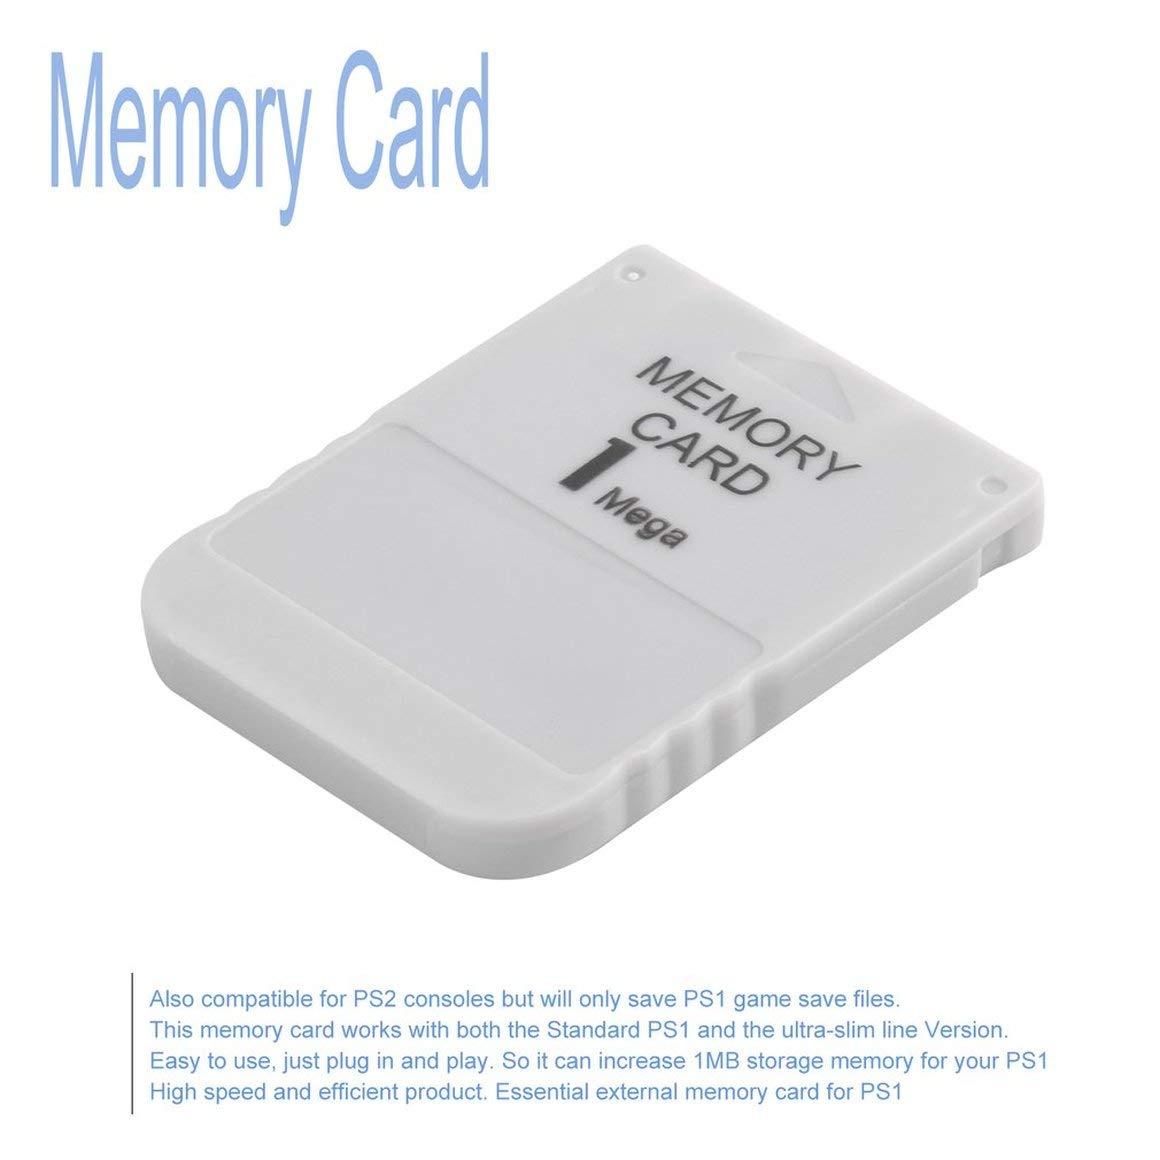 Funnyrunstore PS1 Memory Card 1 Mega Memory Card para Playstation 1 One PS1 PSX Game Útil Práctica asequible White 1M 1MB (Color: Blanco)